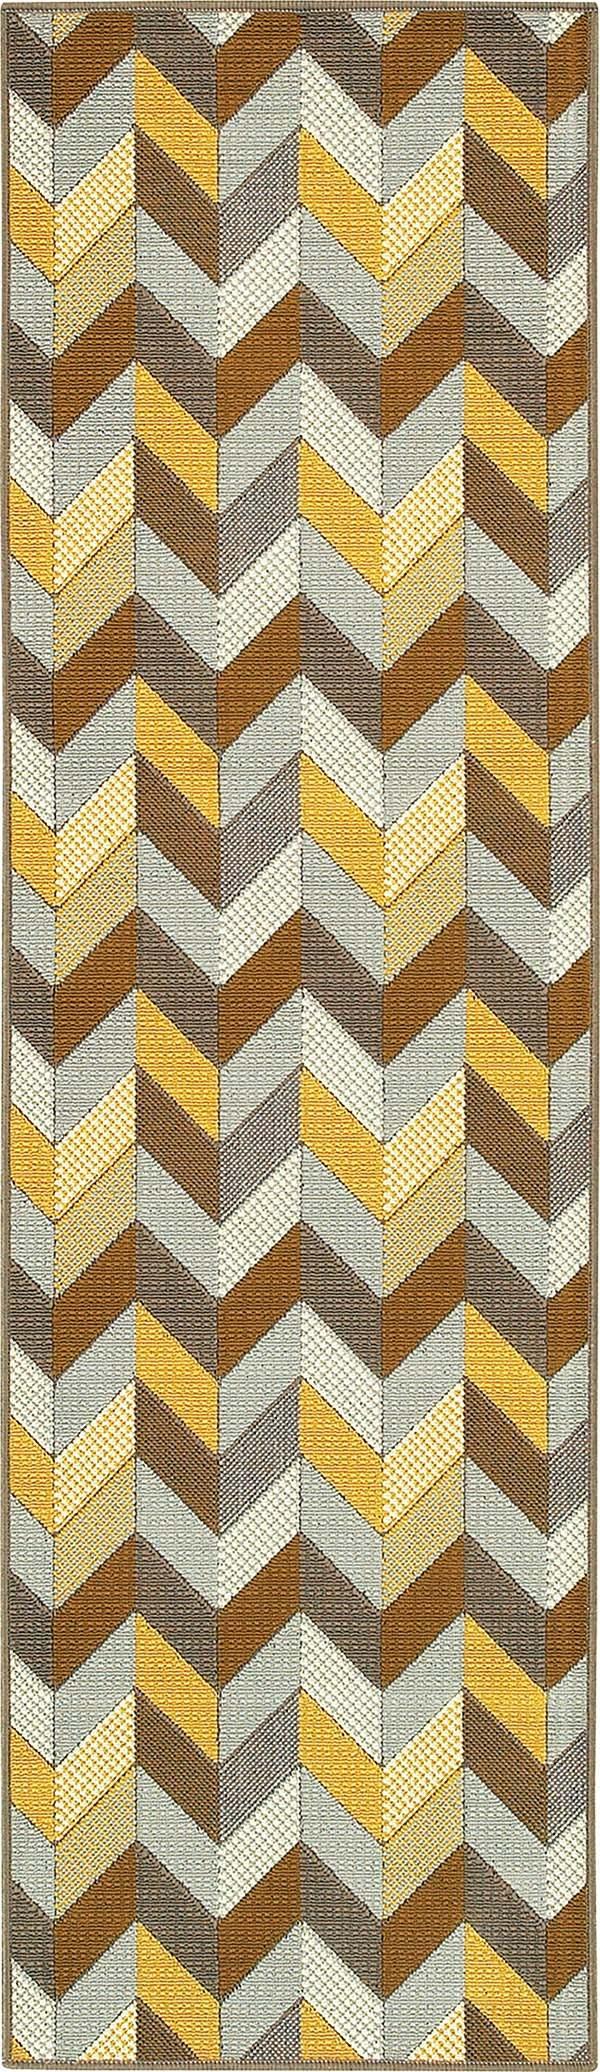 Grey, Blue, Gold (X) Contemporary / Modern Area Rug